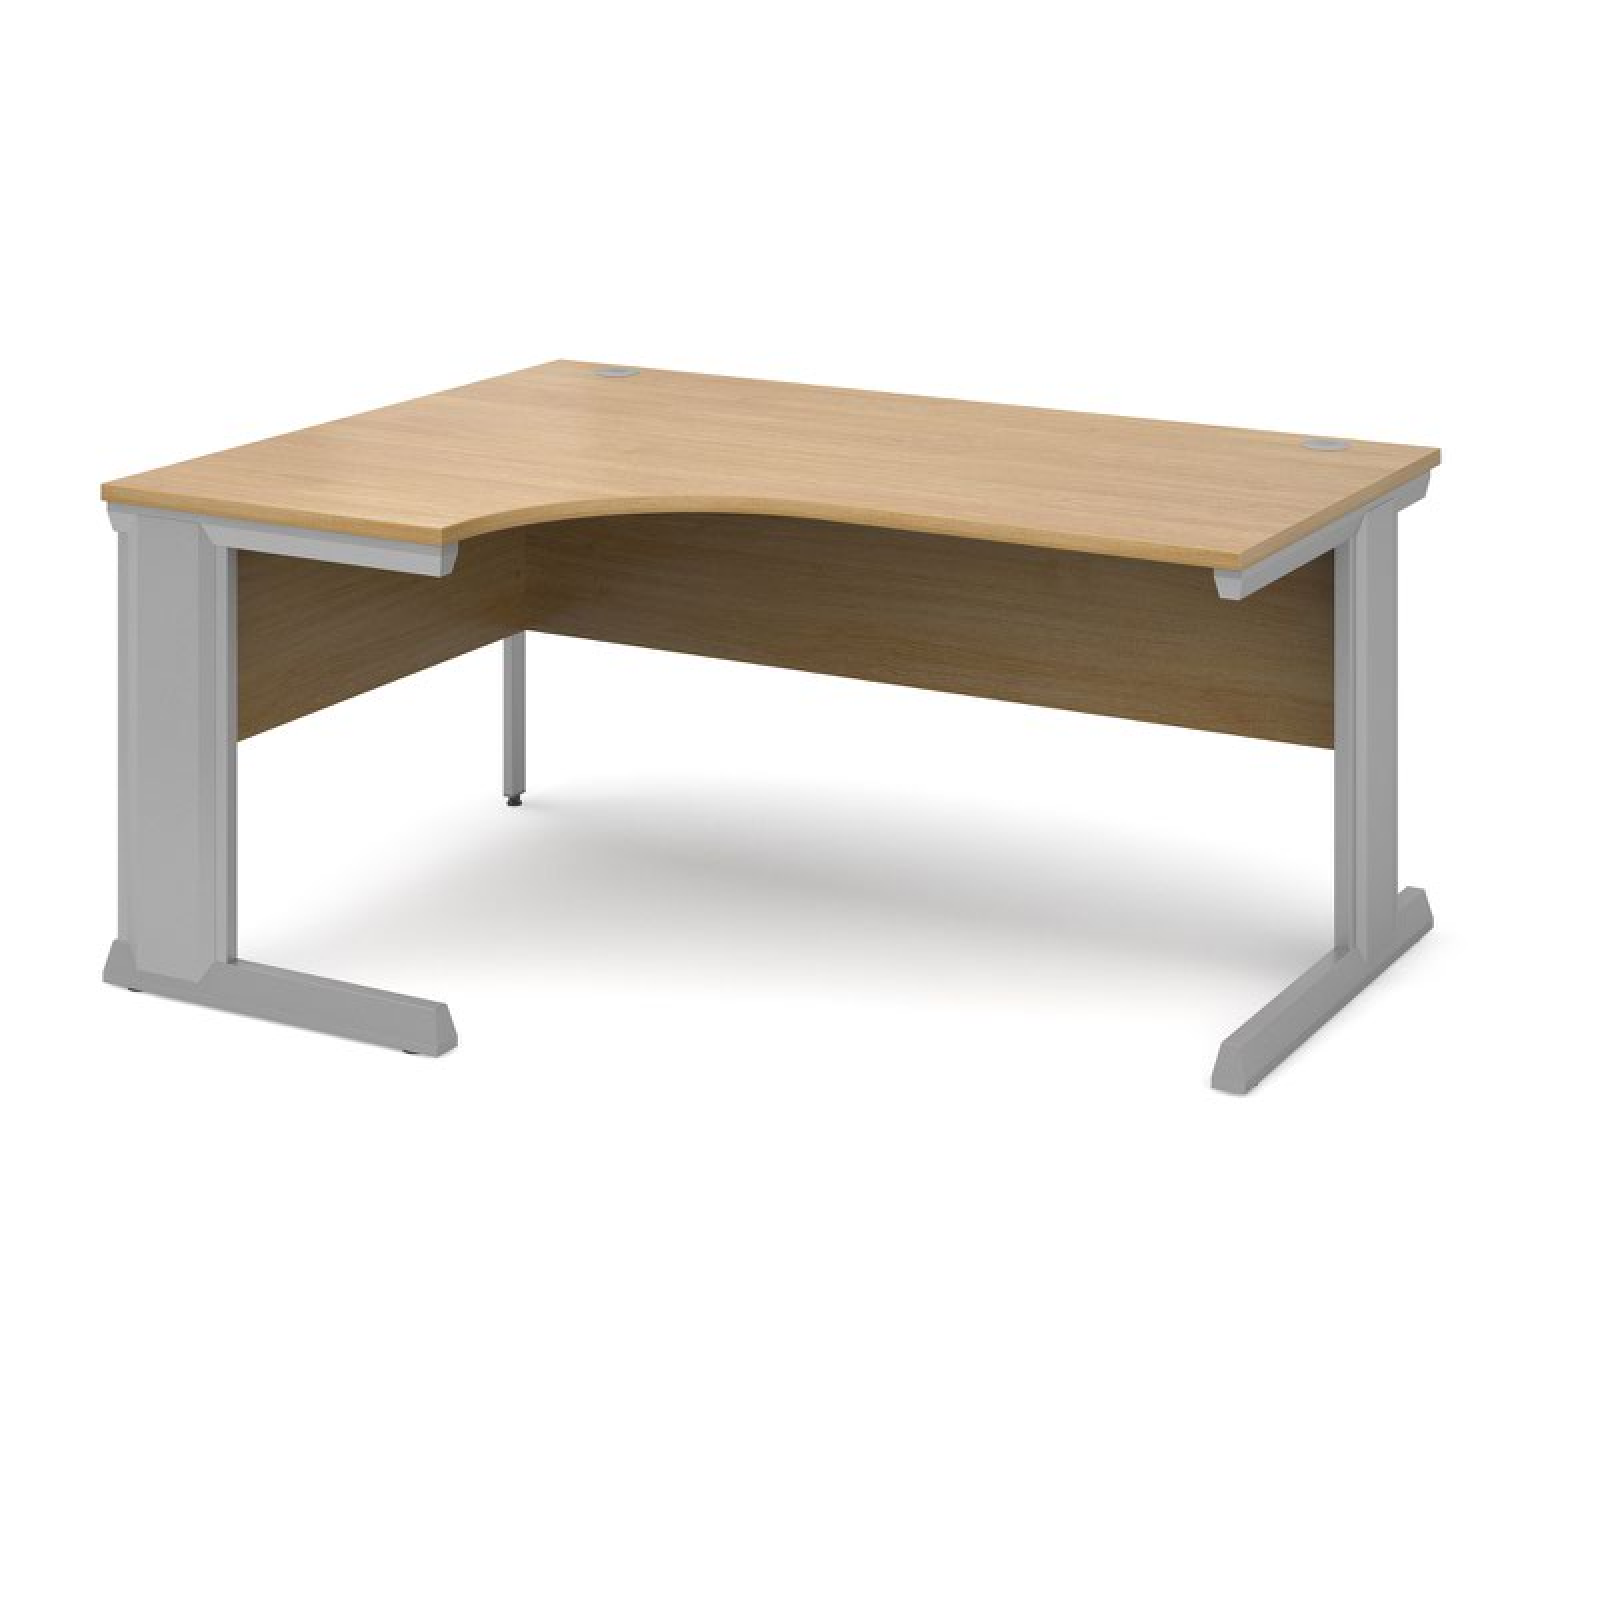 Compare prices for Vivo Left Hand Ergonomic Desk 1600mm - Silver Frame Oak Top